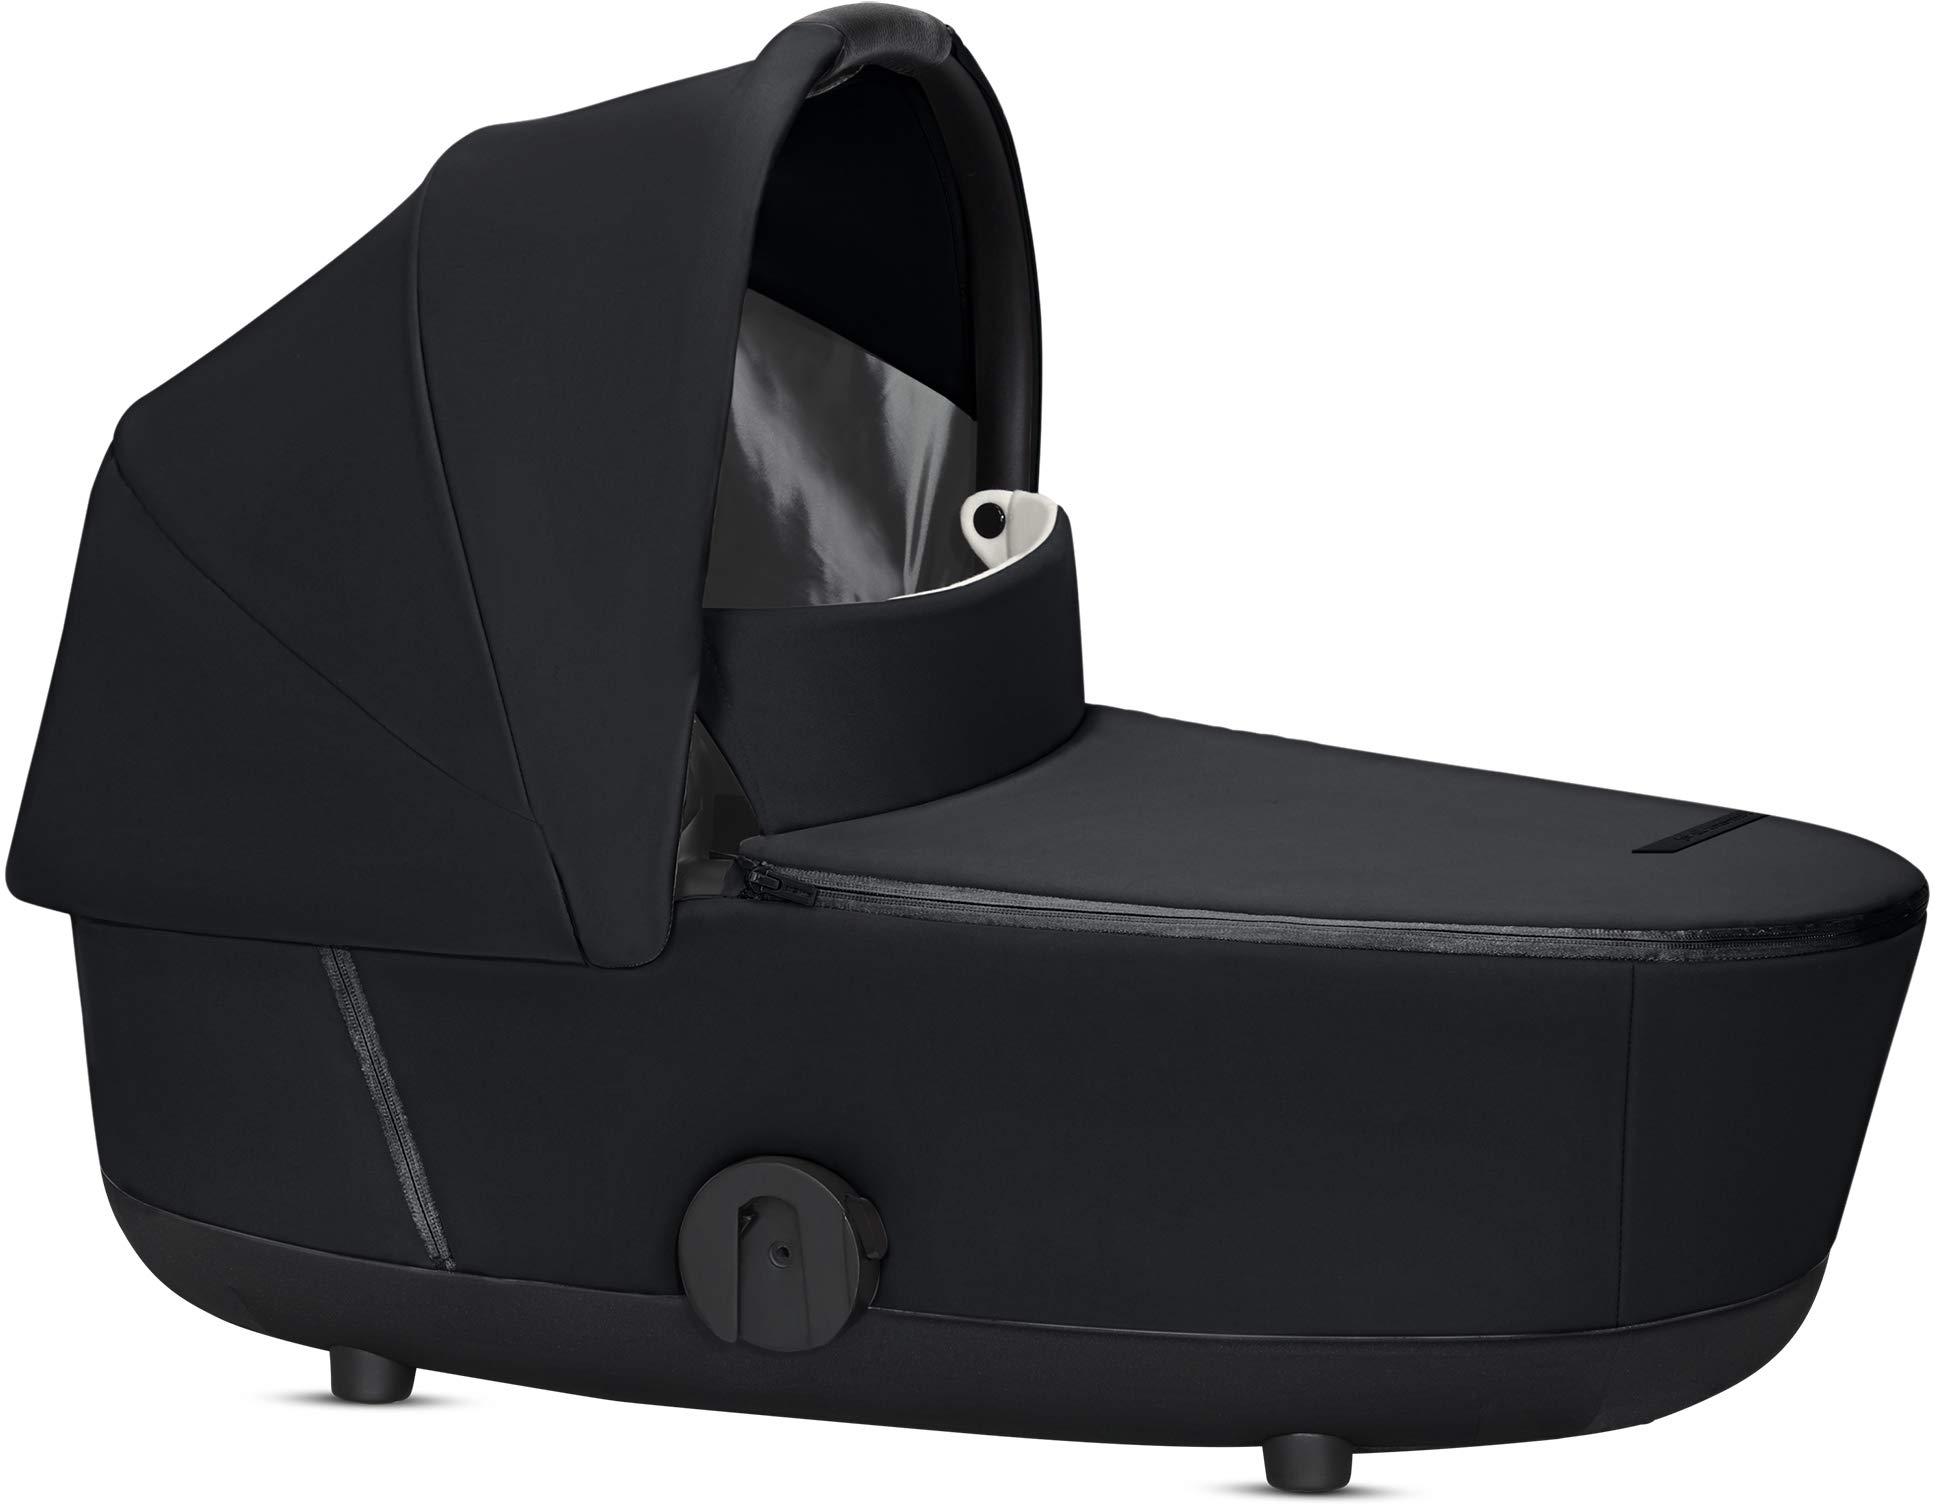 Cybex Mios Lux Carry Cot Premium Black